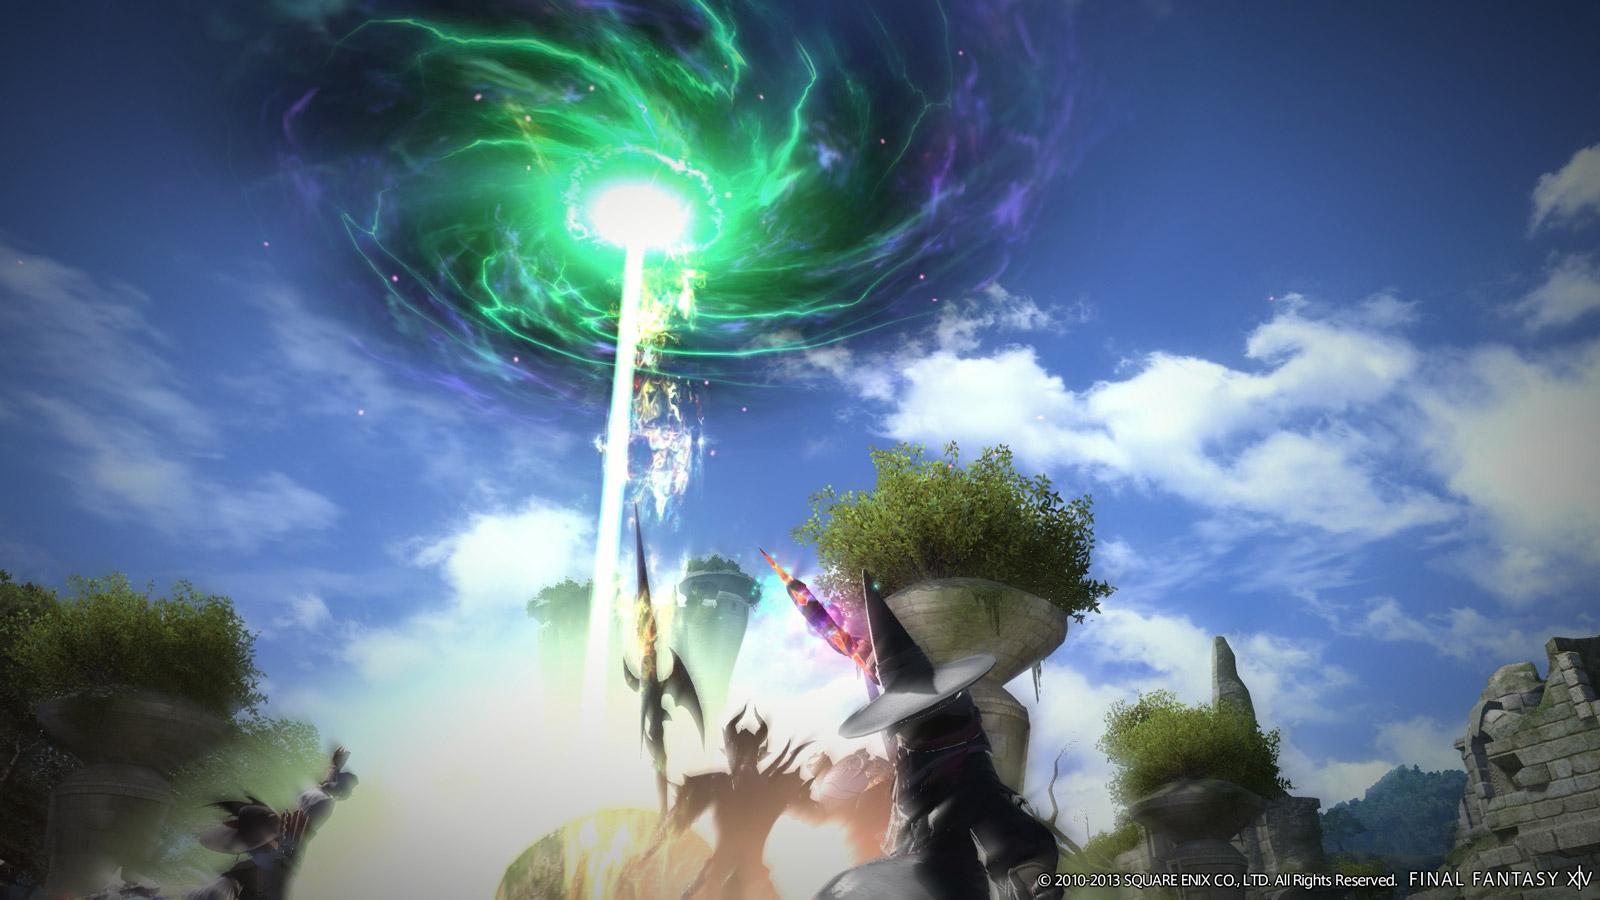 Free Final Fantasy XIV Wallpaper in 1600x900